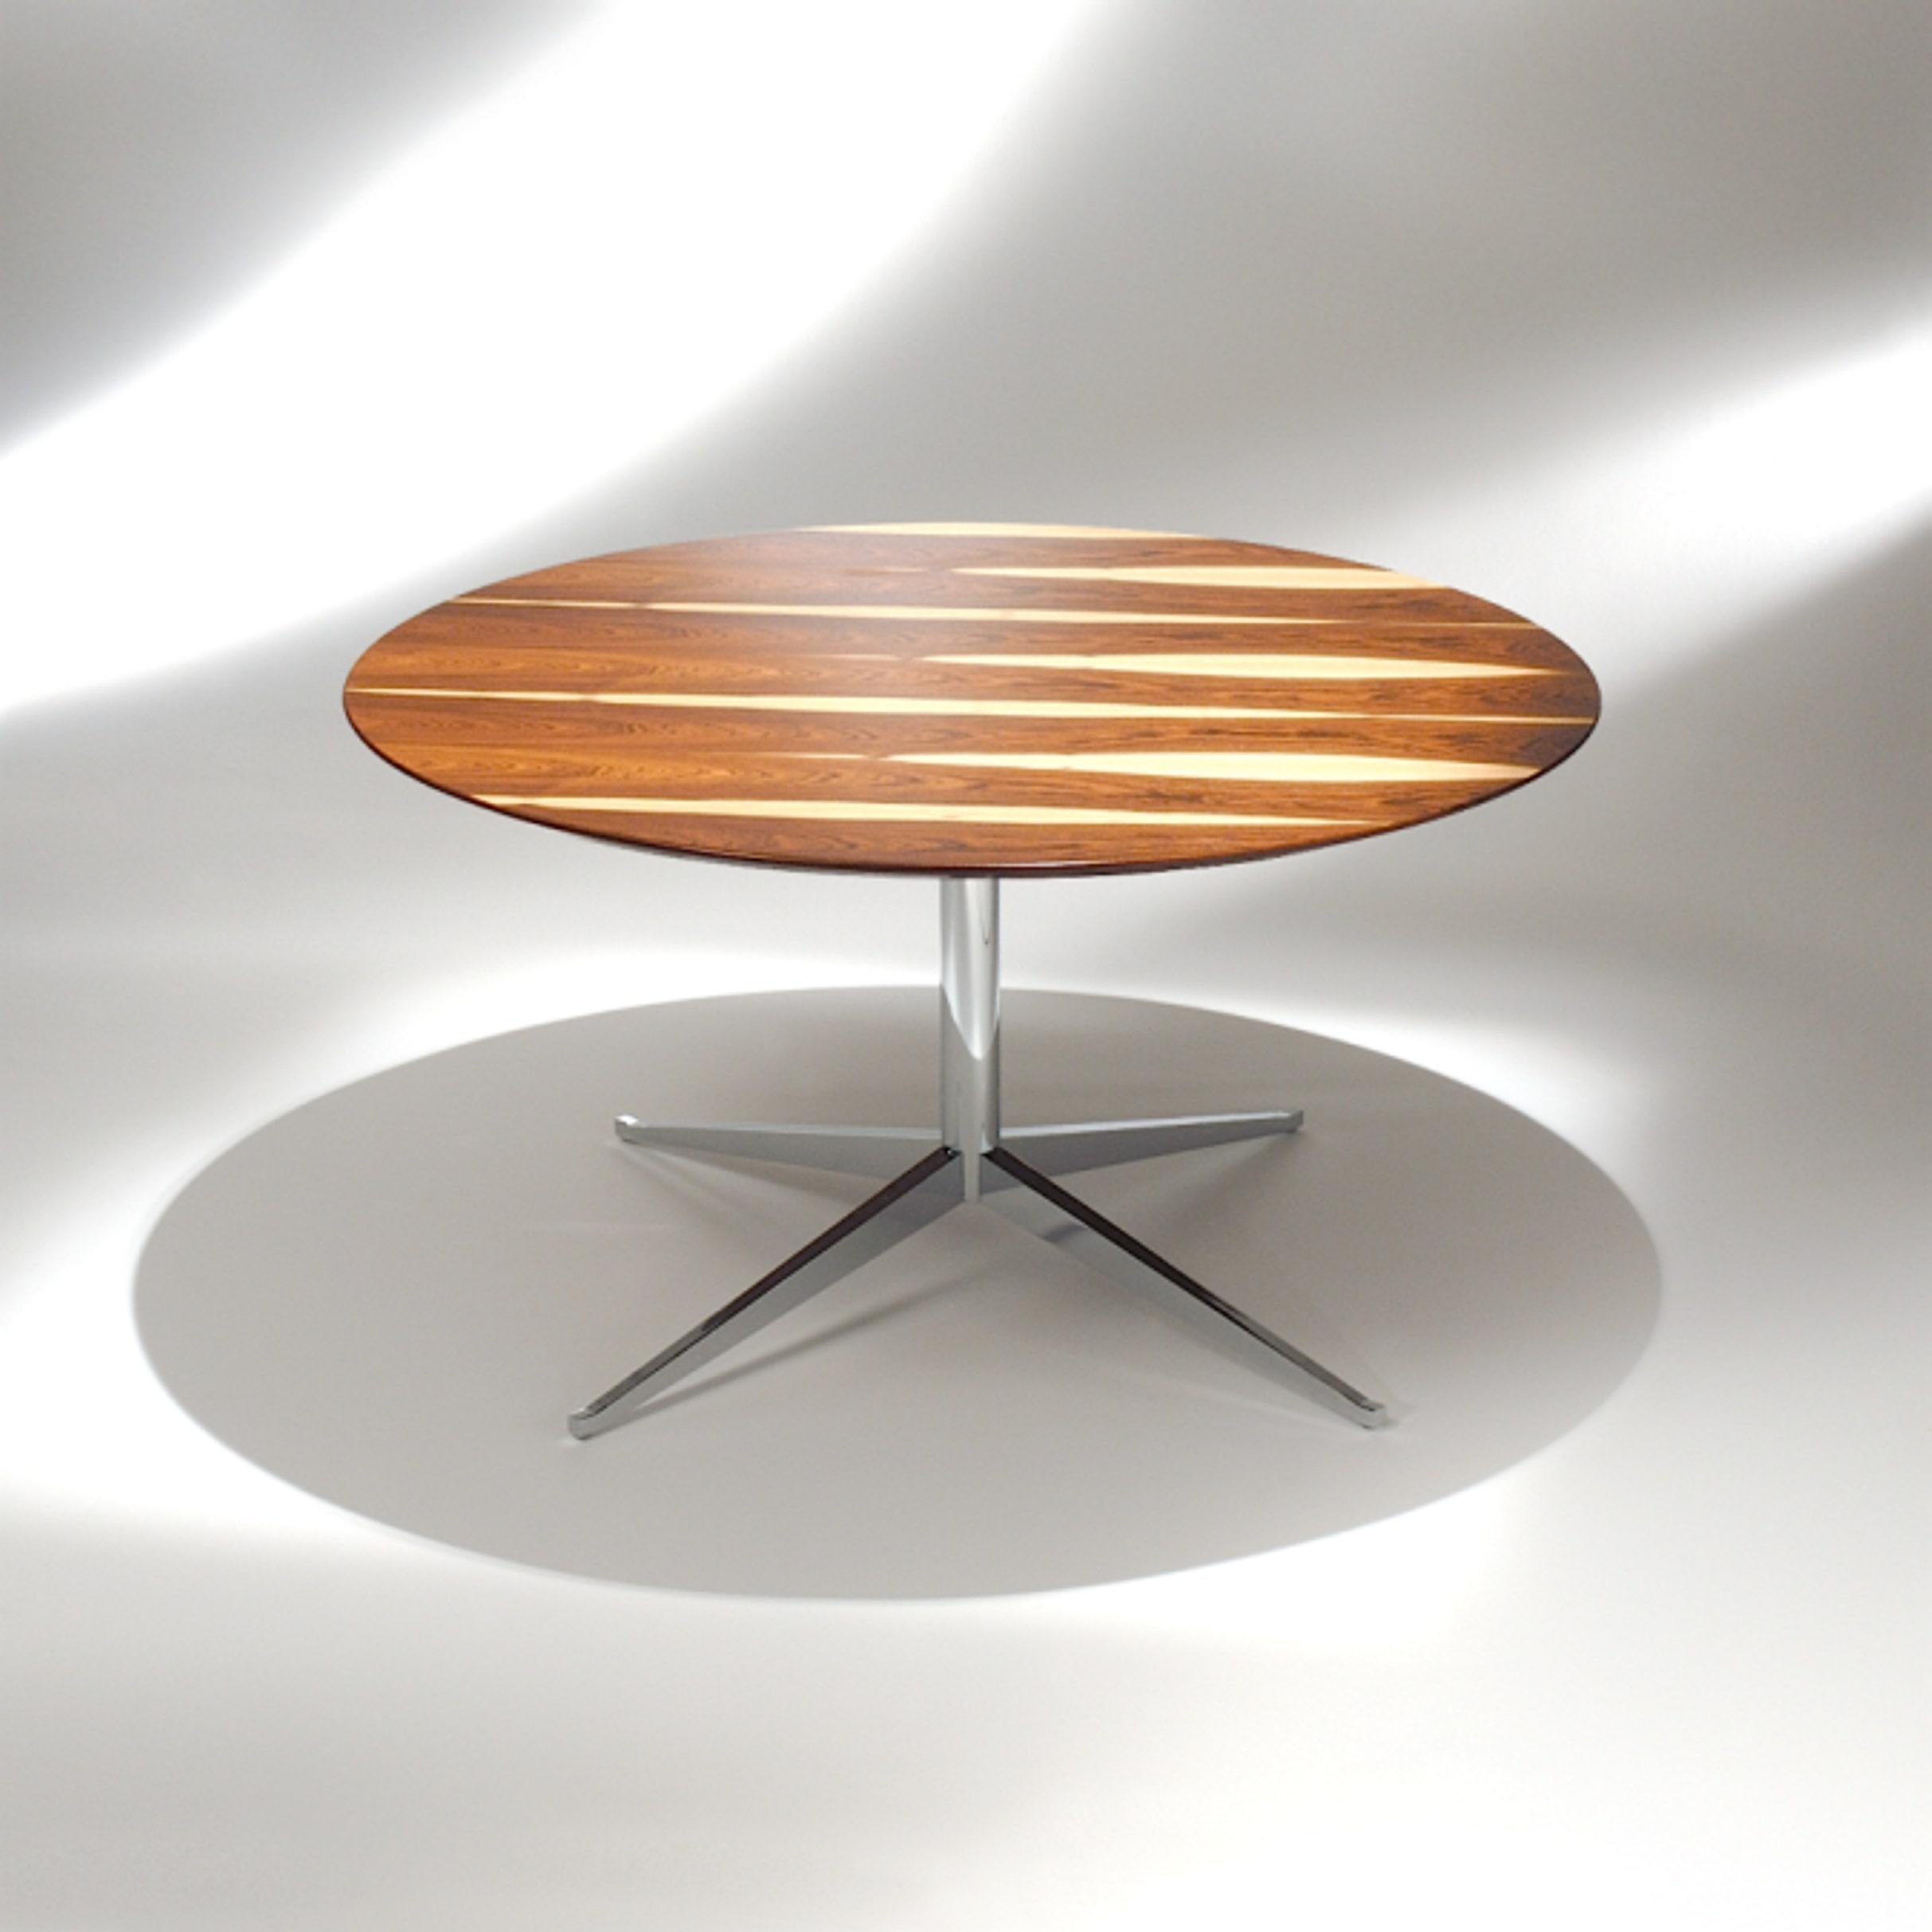 Mesa de Jantar FK2 Studio Mais Design by Florence Knoll